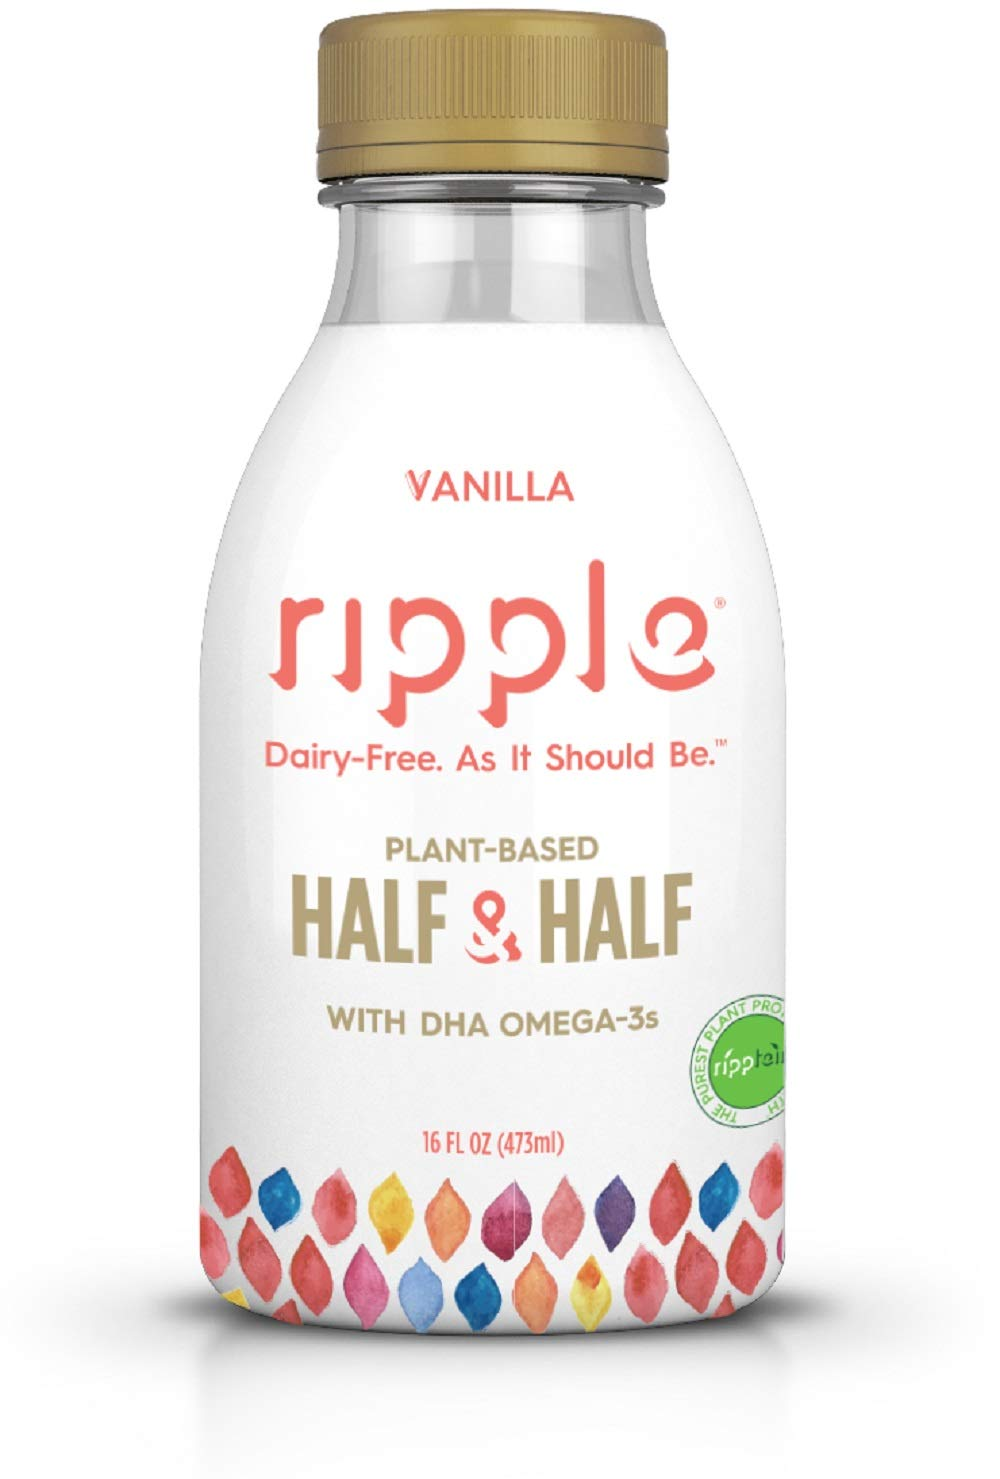 Ripple Original Dairy Free Plant Based Half & Half Vanilla ...